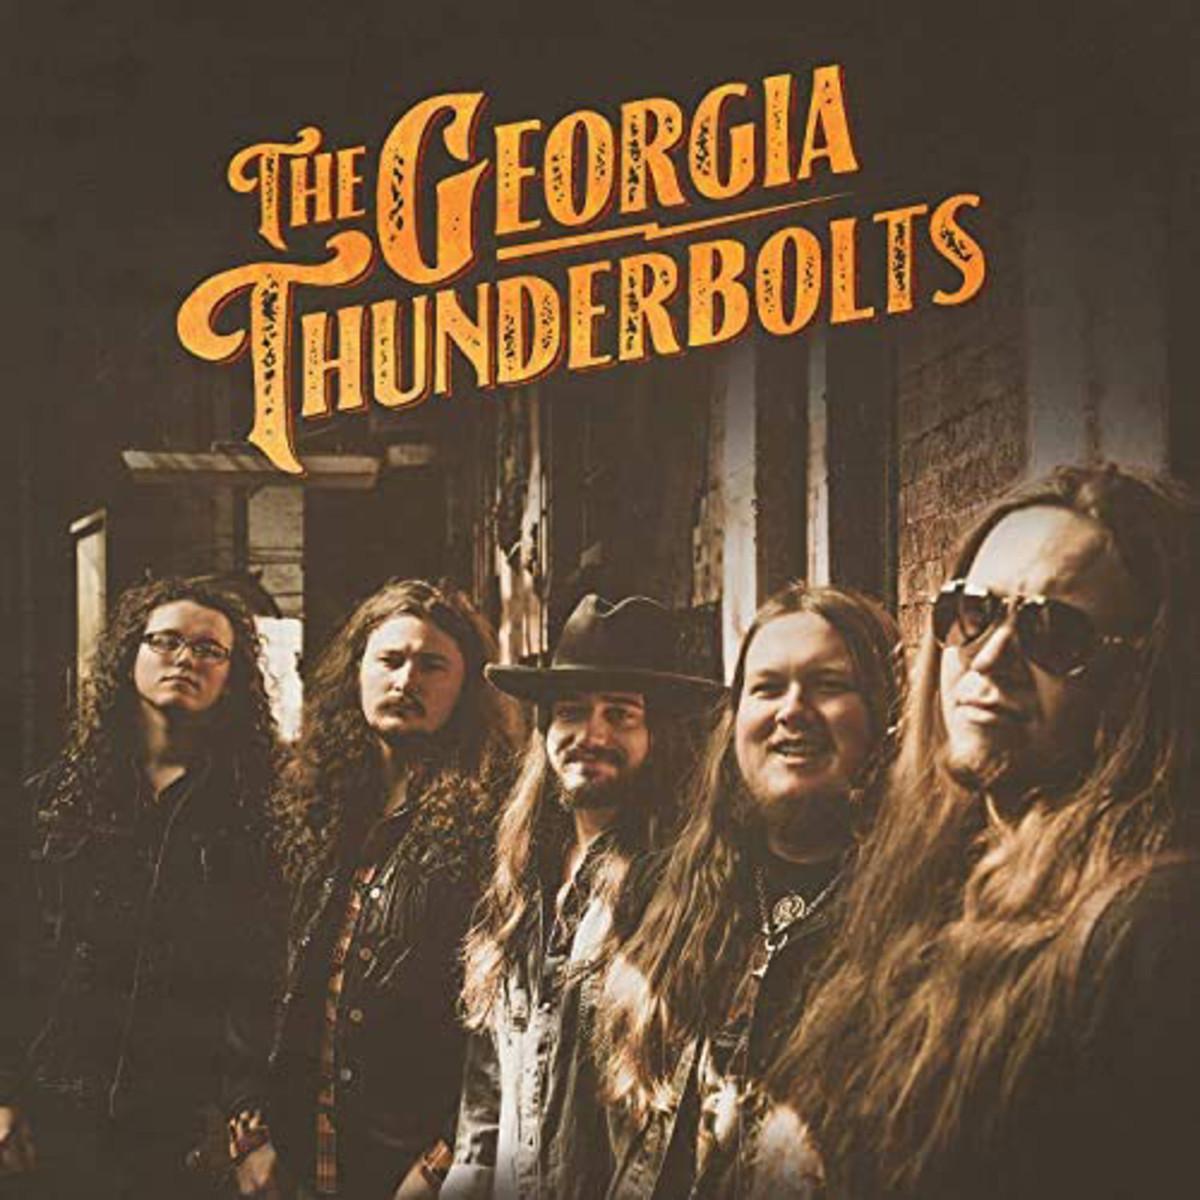 georgia thunderbolts